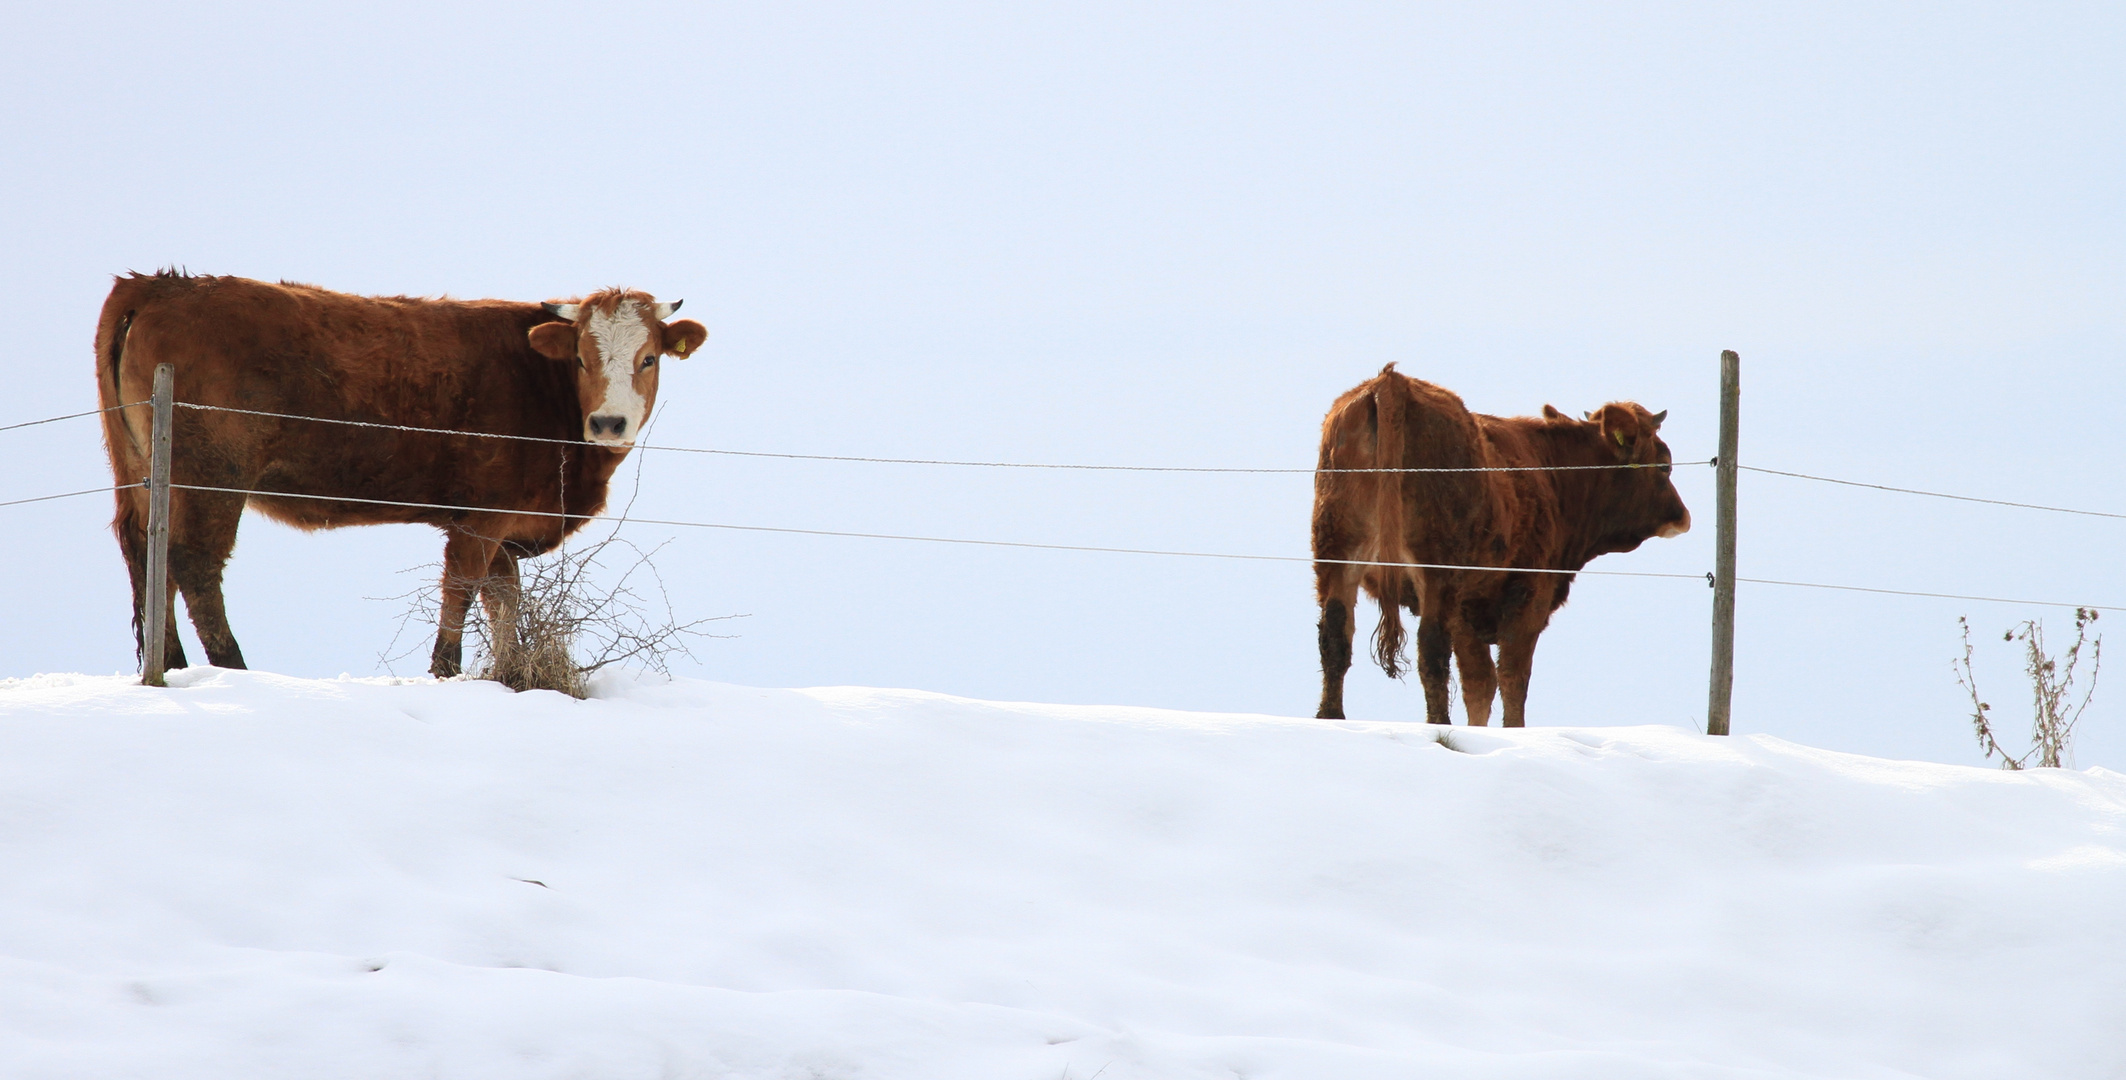 Mei so guad schmeckt der Schnee a wieda ned, muhh.....